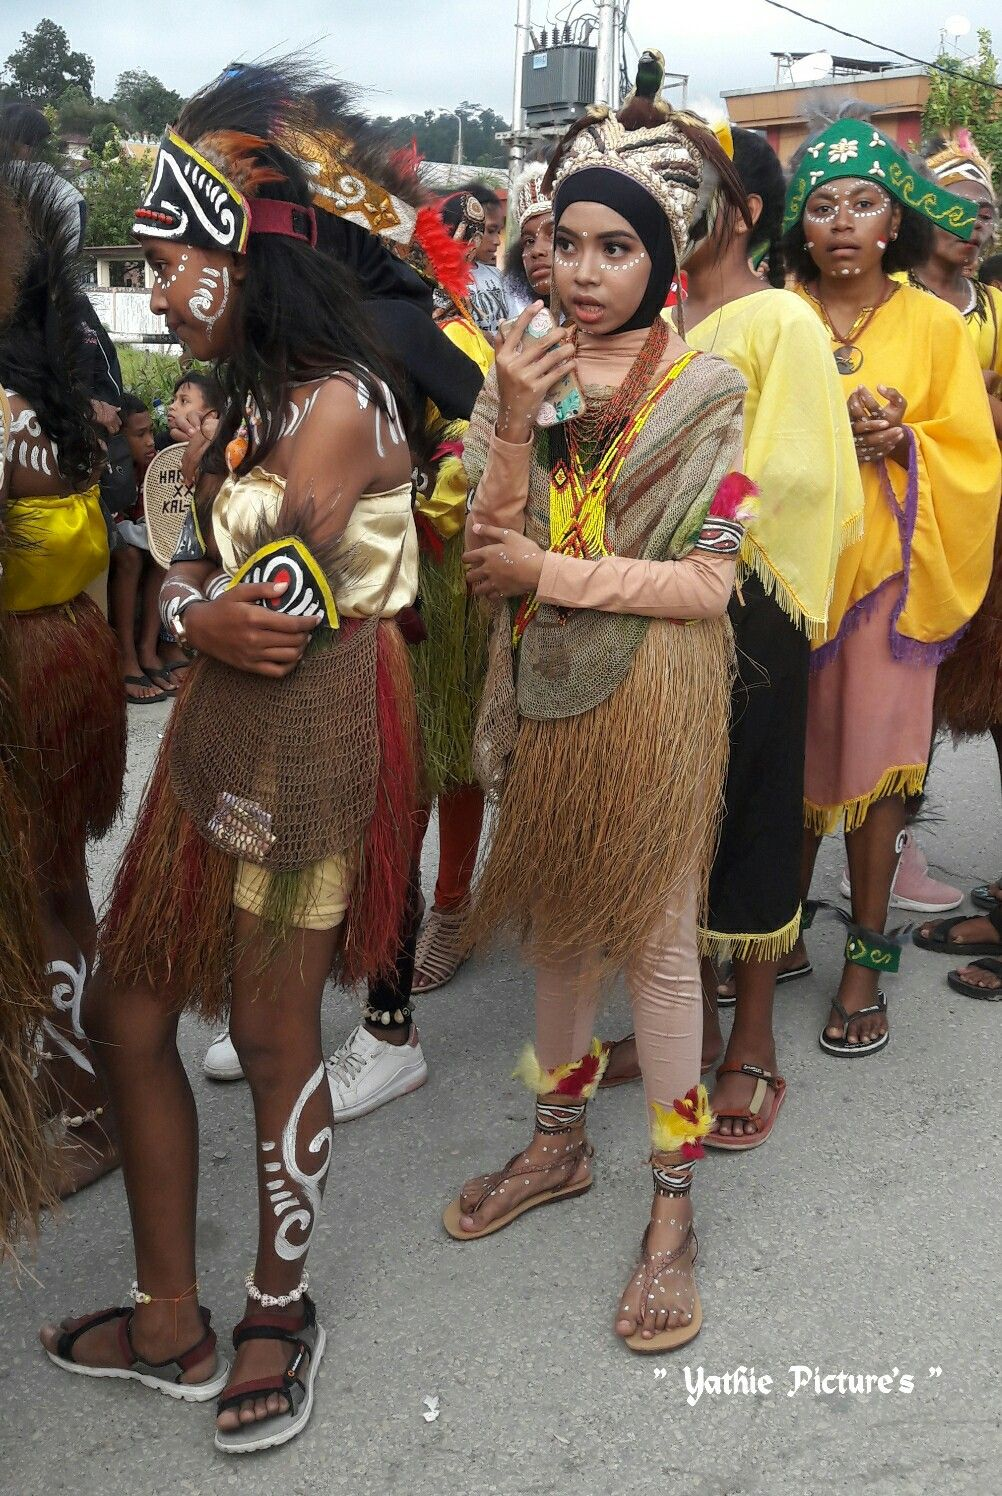 Pakaian Adat Daerah Papua Barat - Pakaian Adat